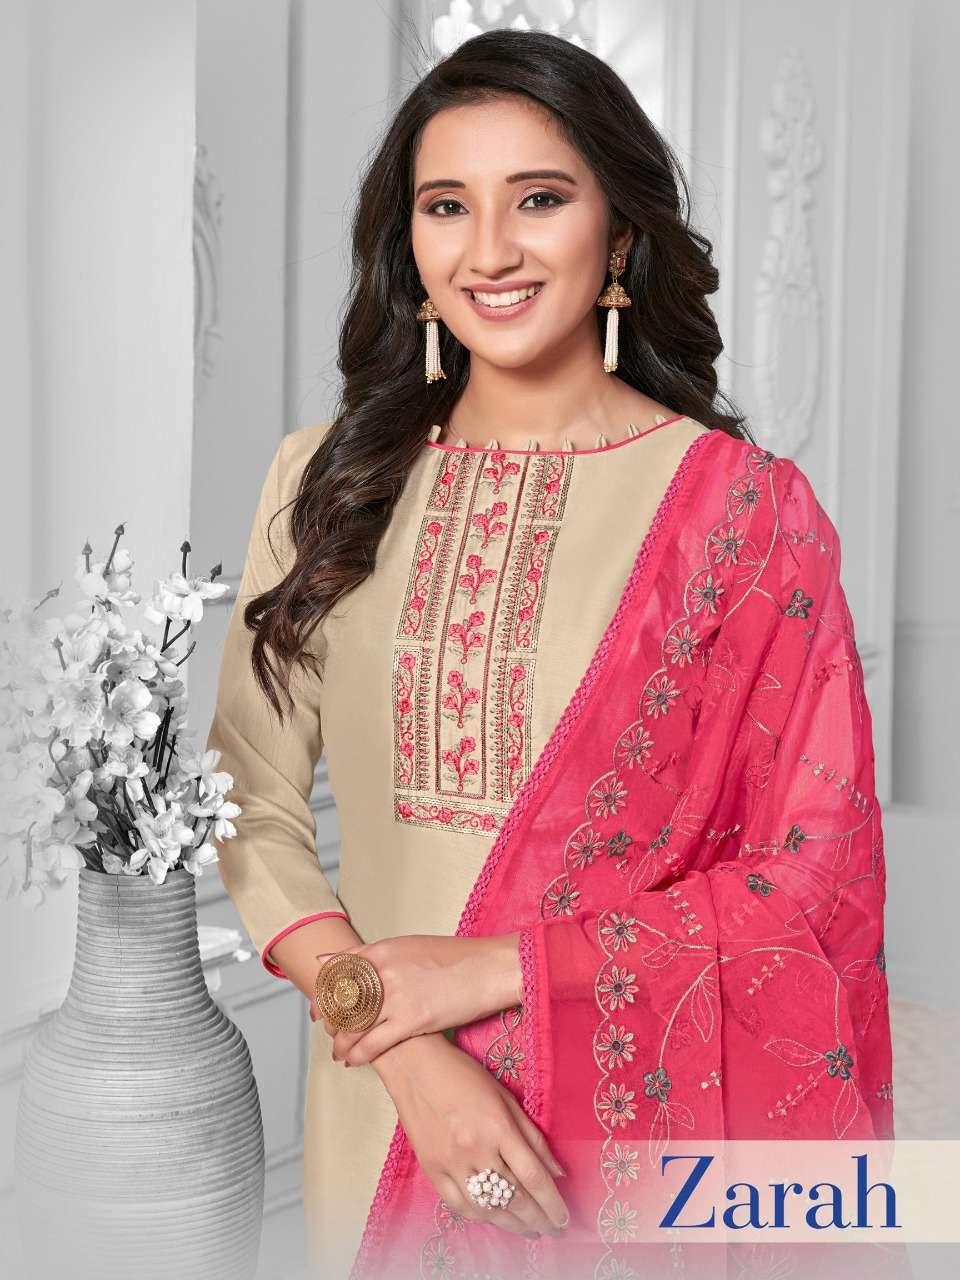 Raghav Royals Zarah Fancy Cotton SIlk Casual Suit Catalog Wholesale Price